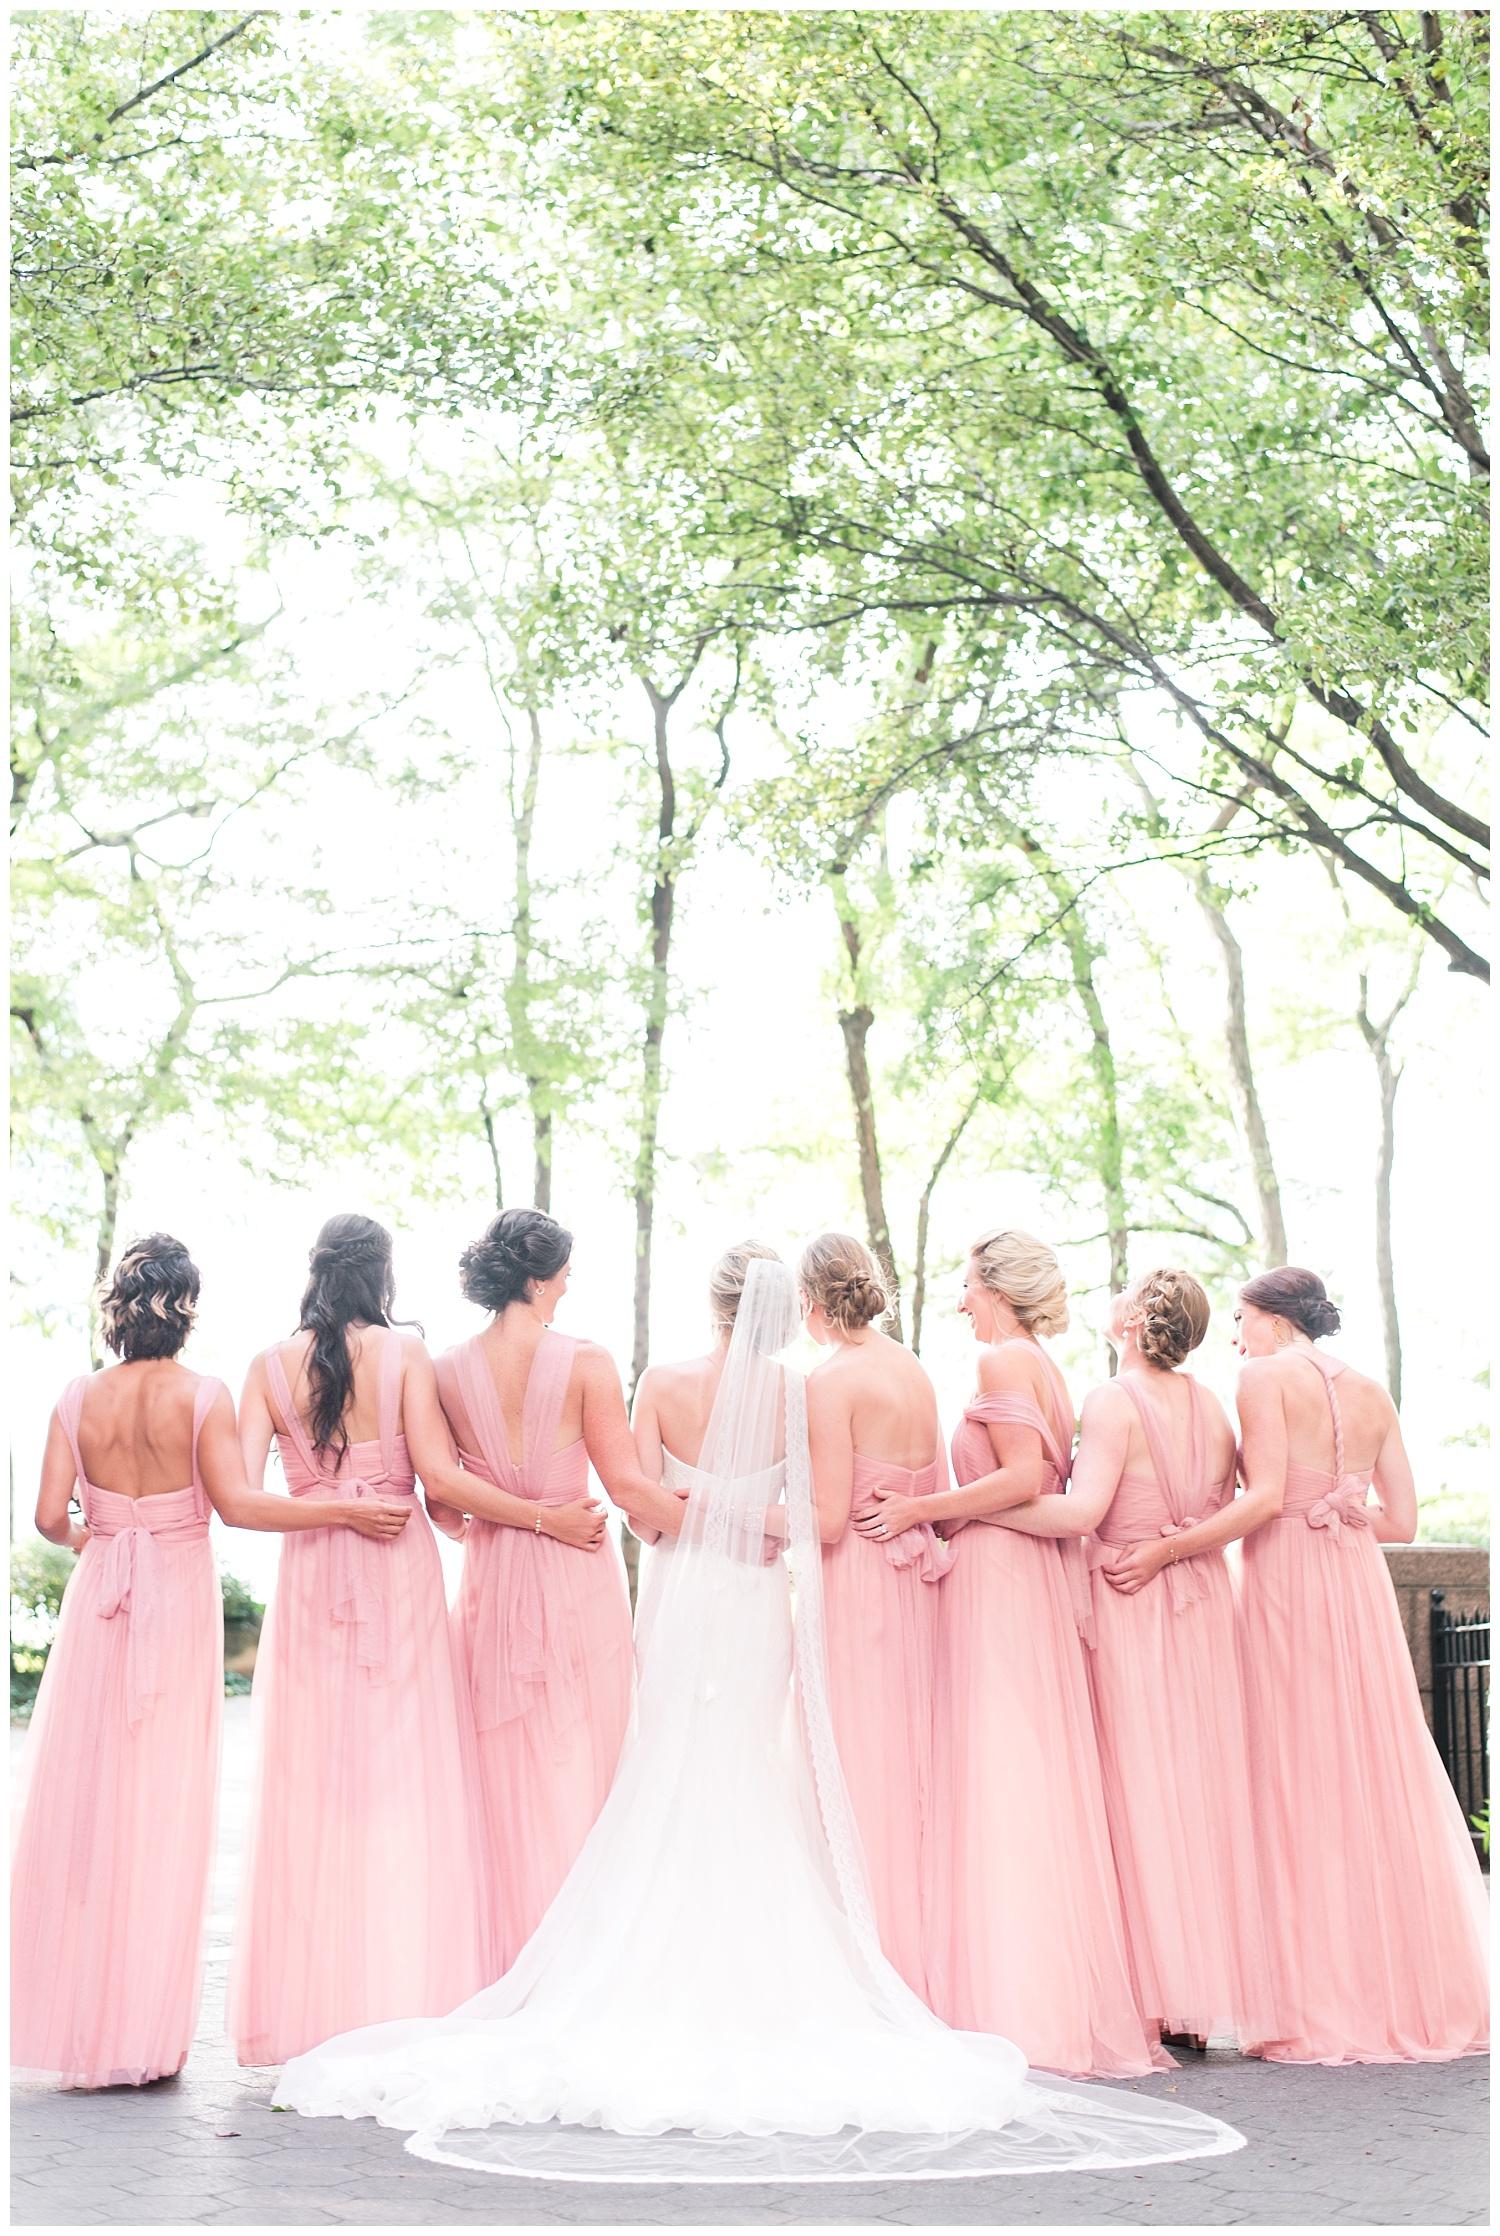 Chelsea_Piers_Lighthouse_Wedding_Fabiana_Skubic_Photography (27).jpg